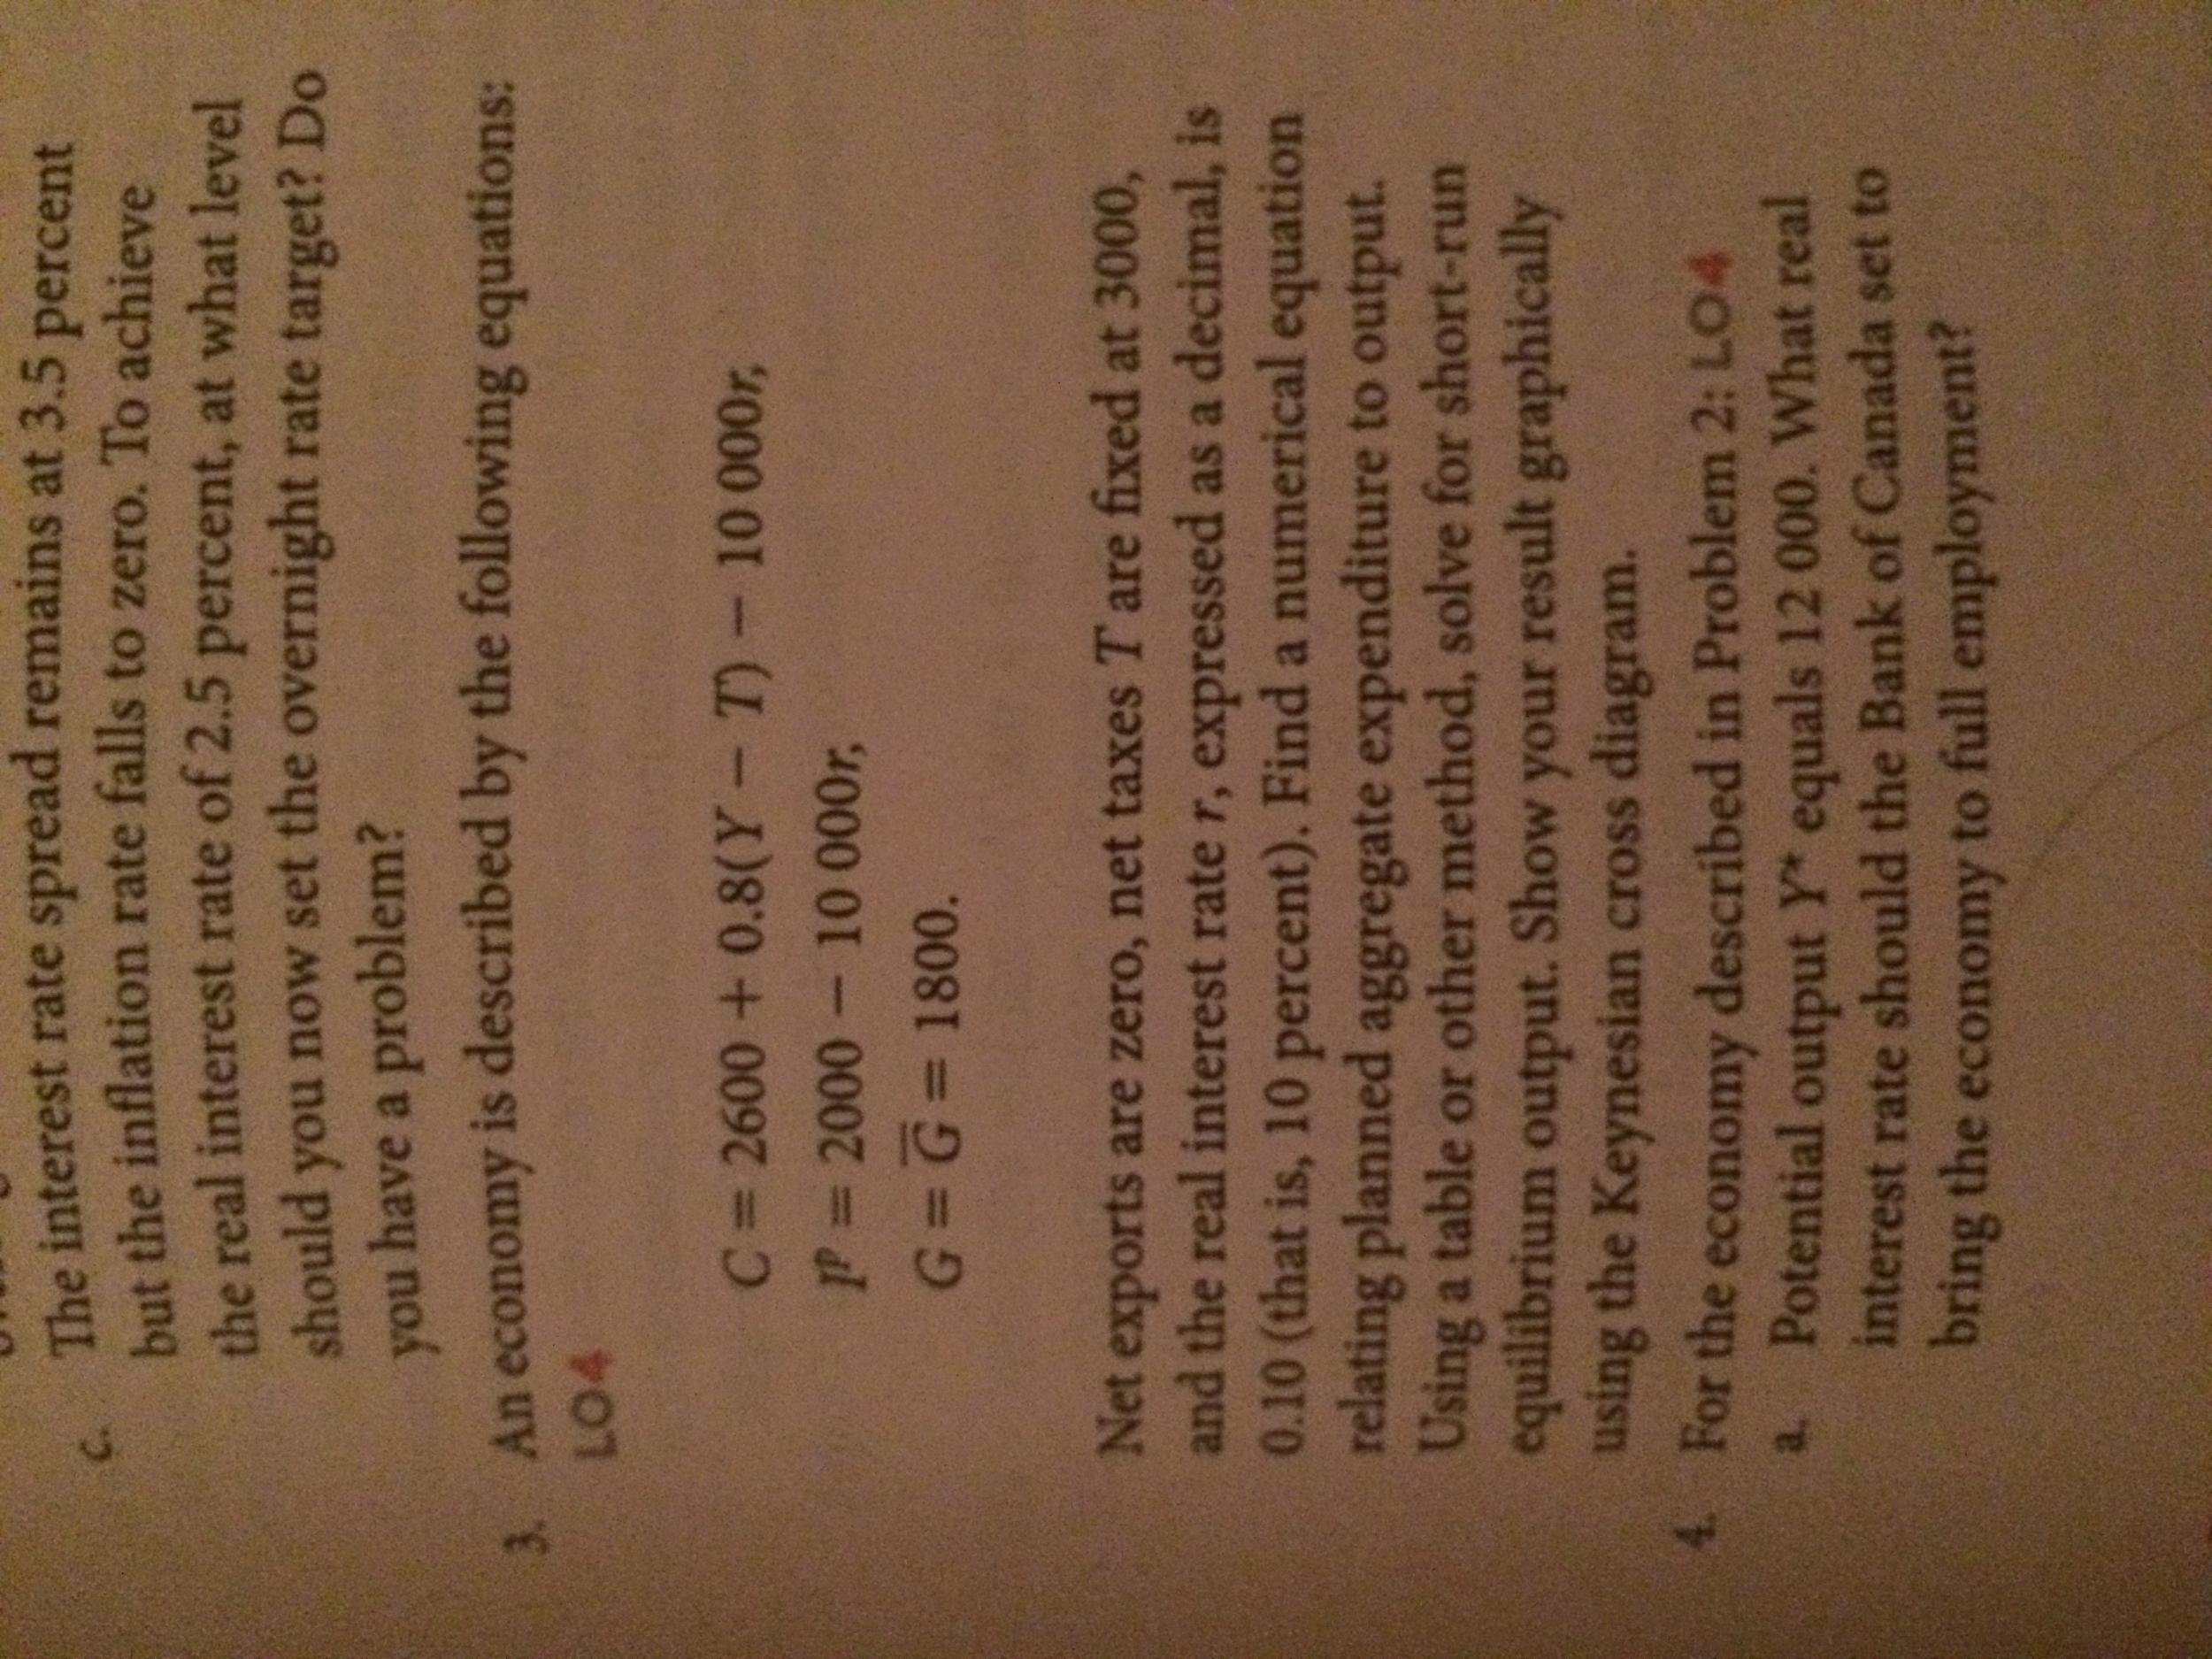 By ben bernanke, by robert frank principles of macroeconomics(text.